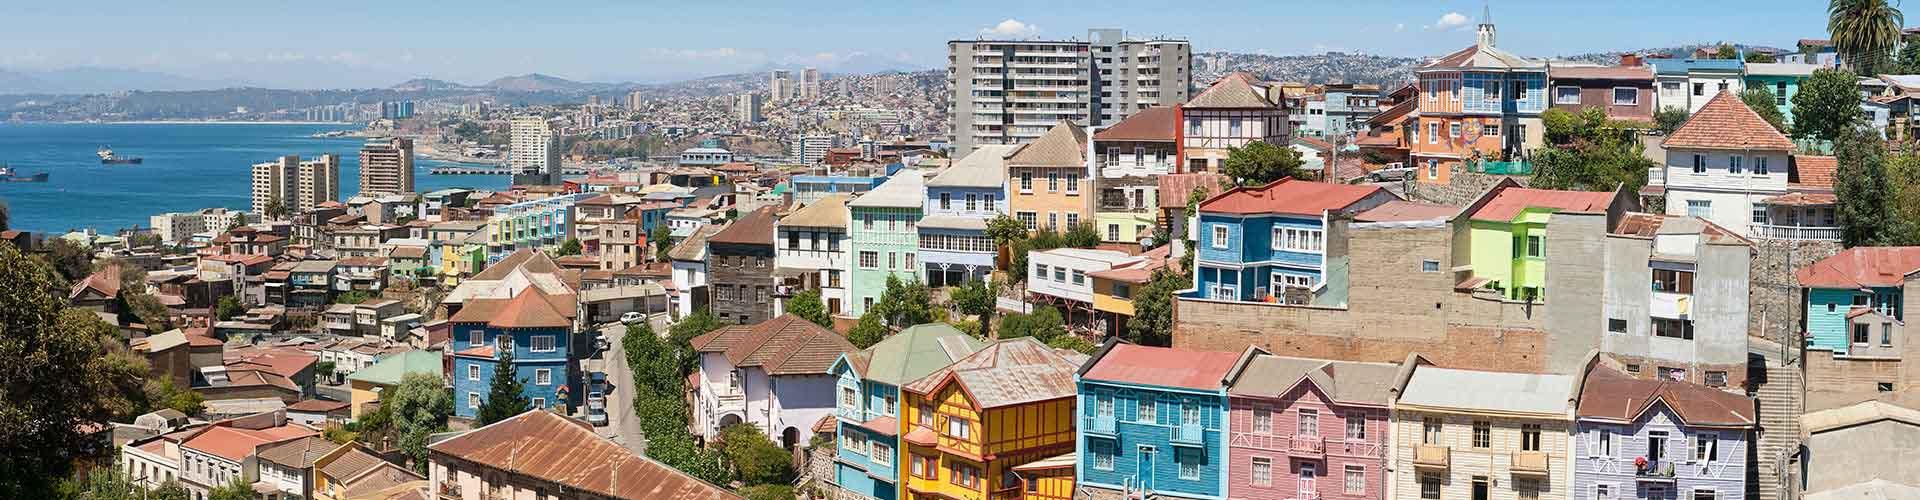 Valparaíso - Hostales en Valparaíso. Mapas de Valparaíso, Fotos y Comentarios para cada hostal en Valparaíso.